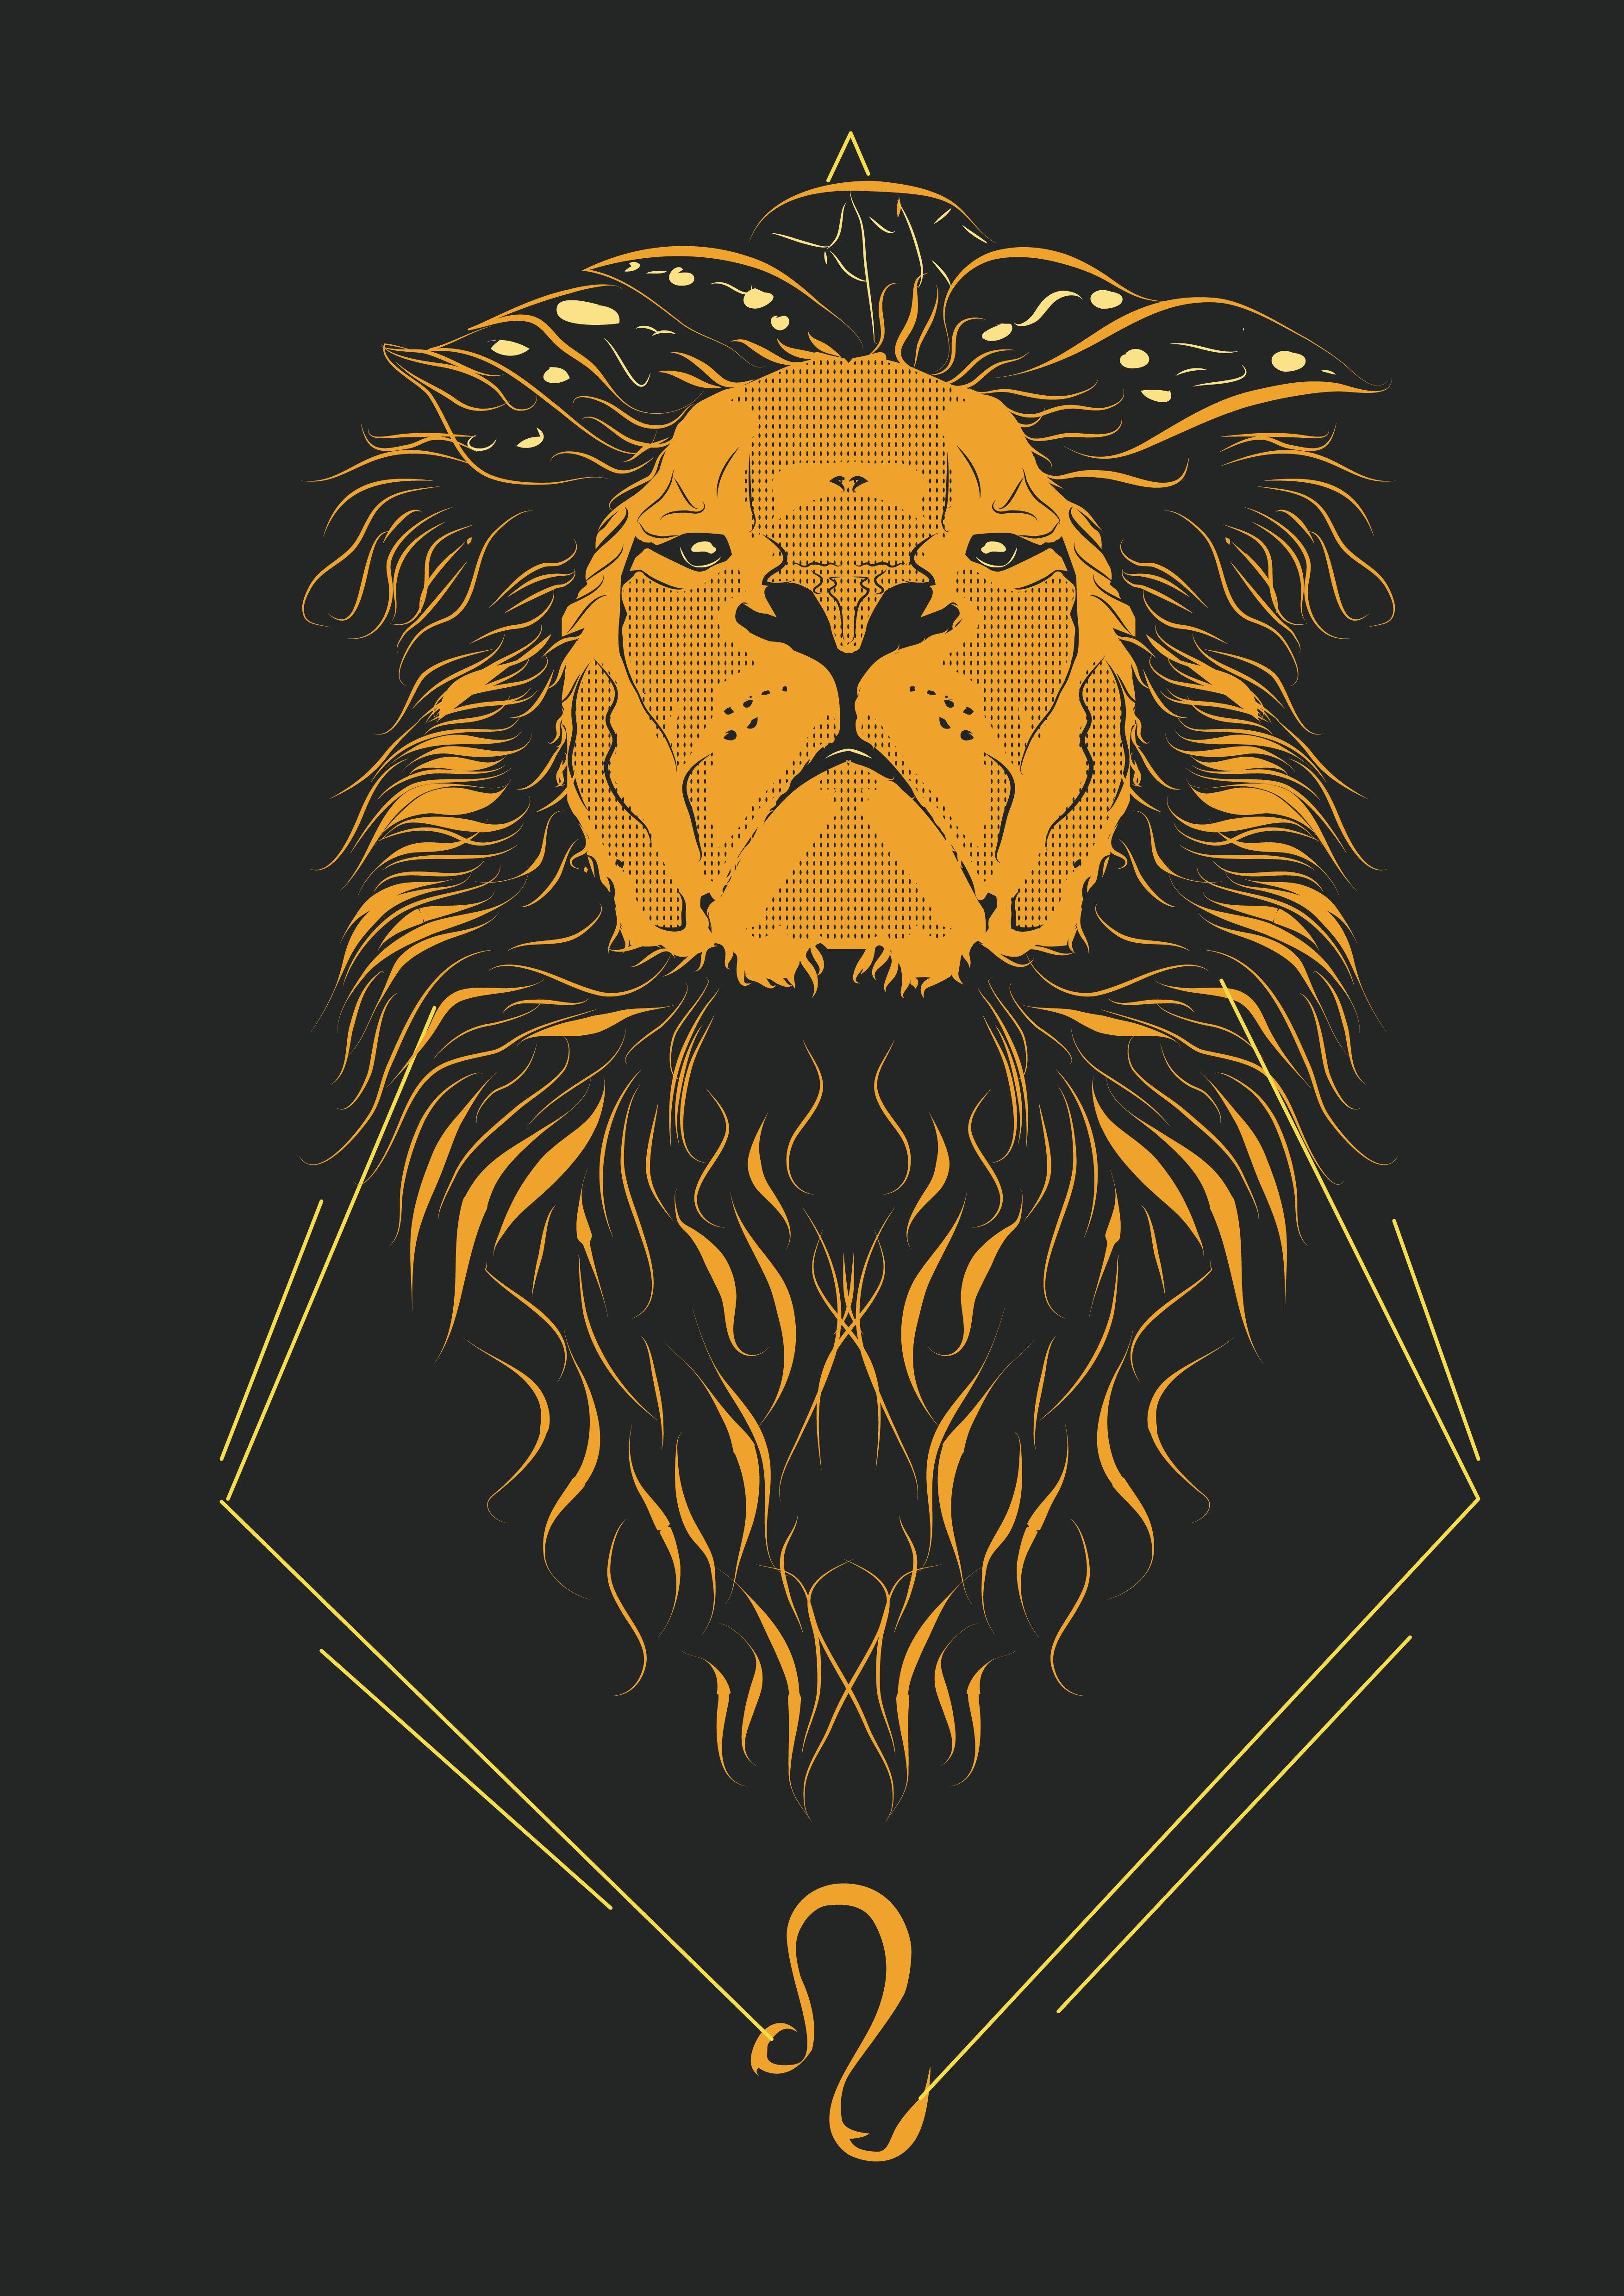 Leo Horoscope For January 31, 2019 - Leo Zodiac , HD Wallpaper & Backgrounds